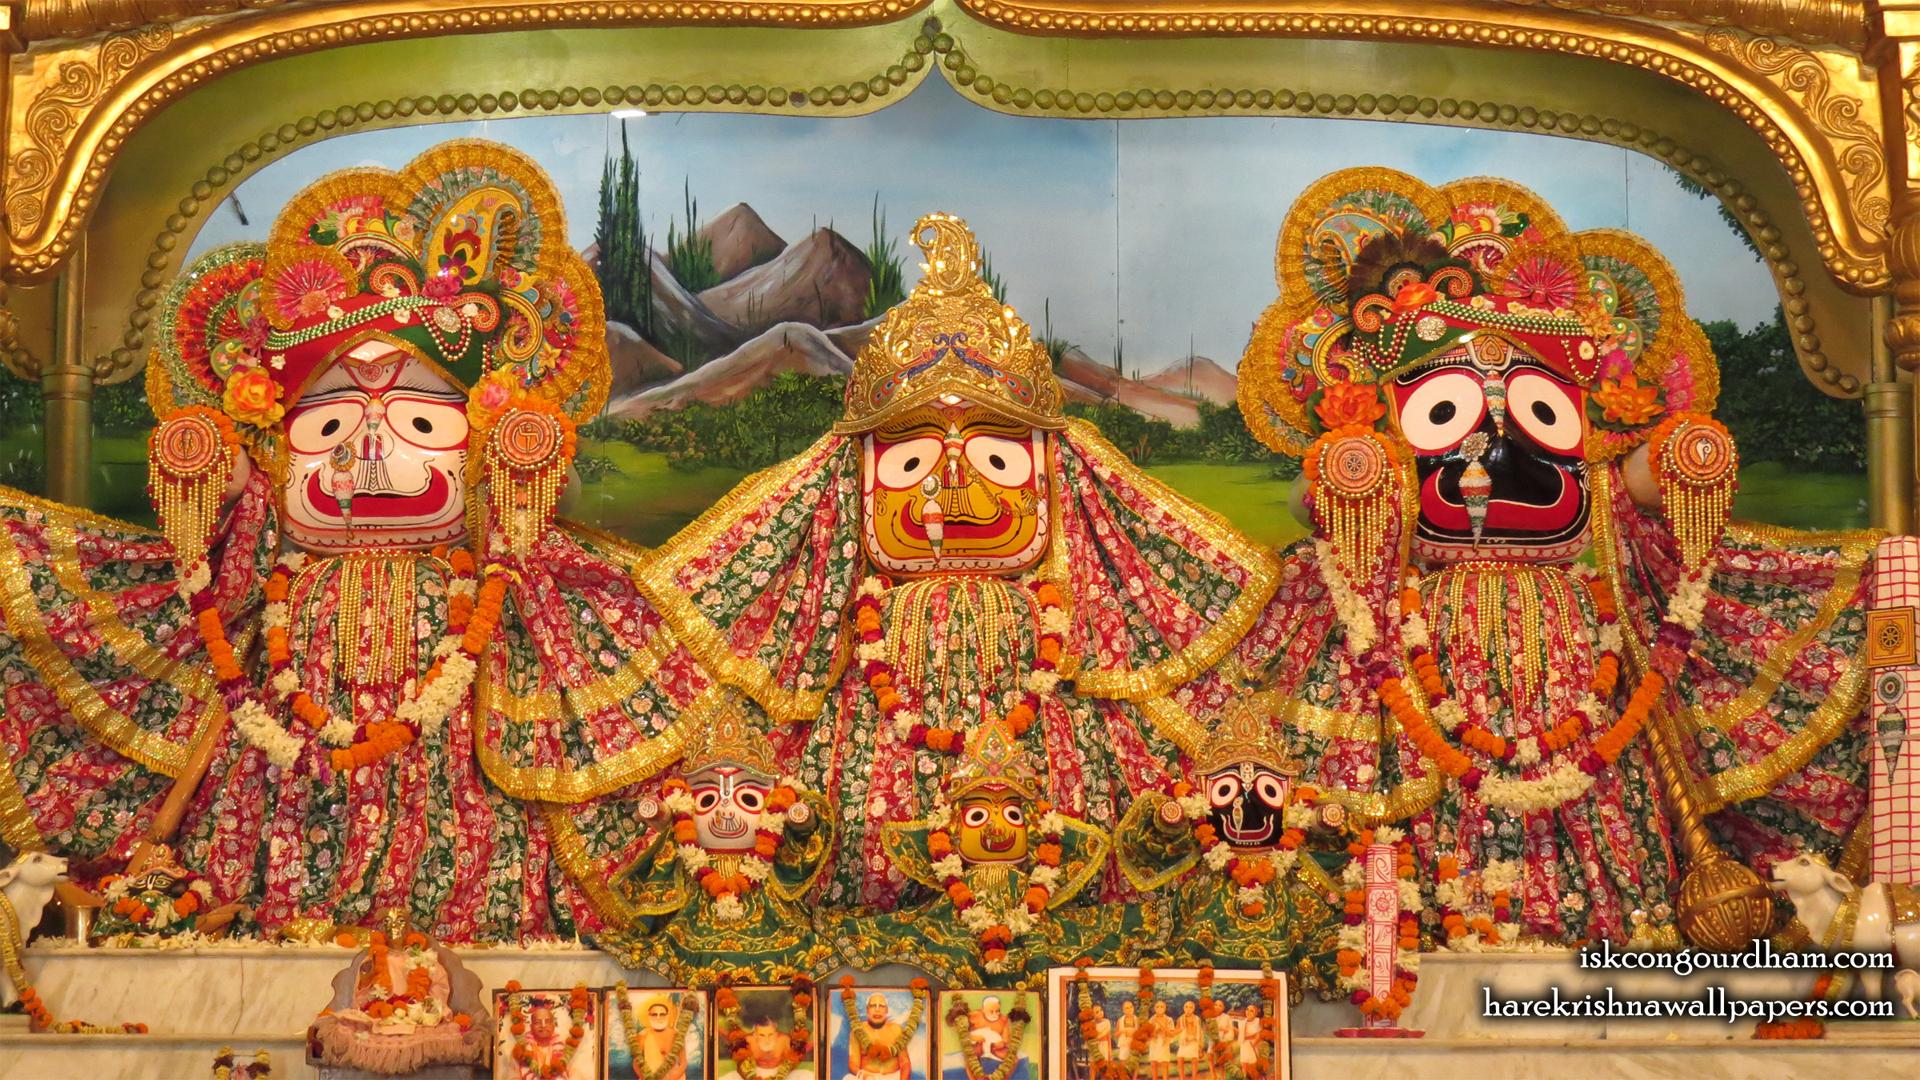 Jagannath Baladeva Subhadra Wallpaper (001) Size 1920x1080 Download